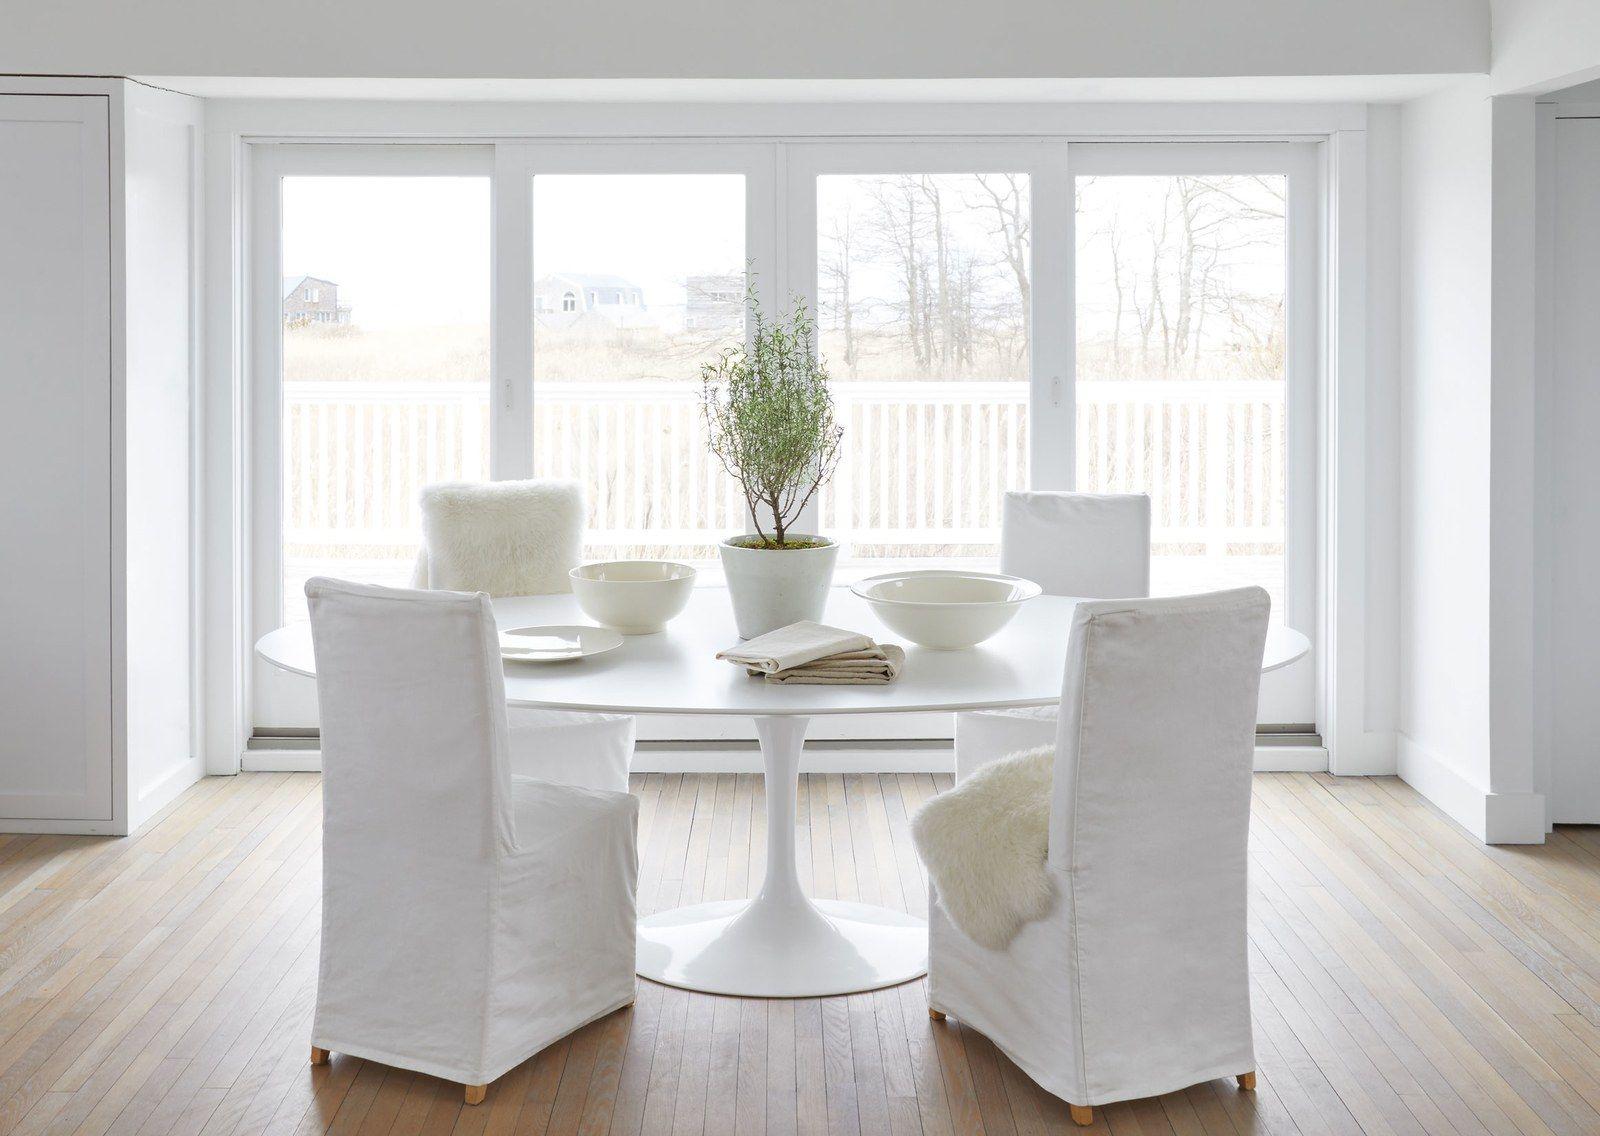 Long Island - slipcovered chairs around a Saarinen table